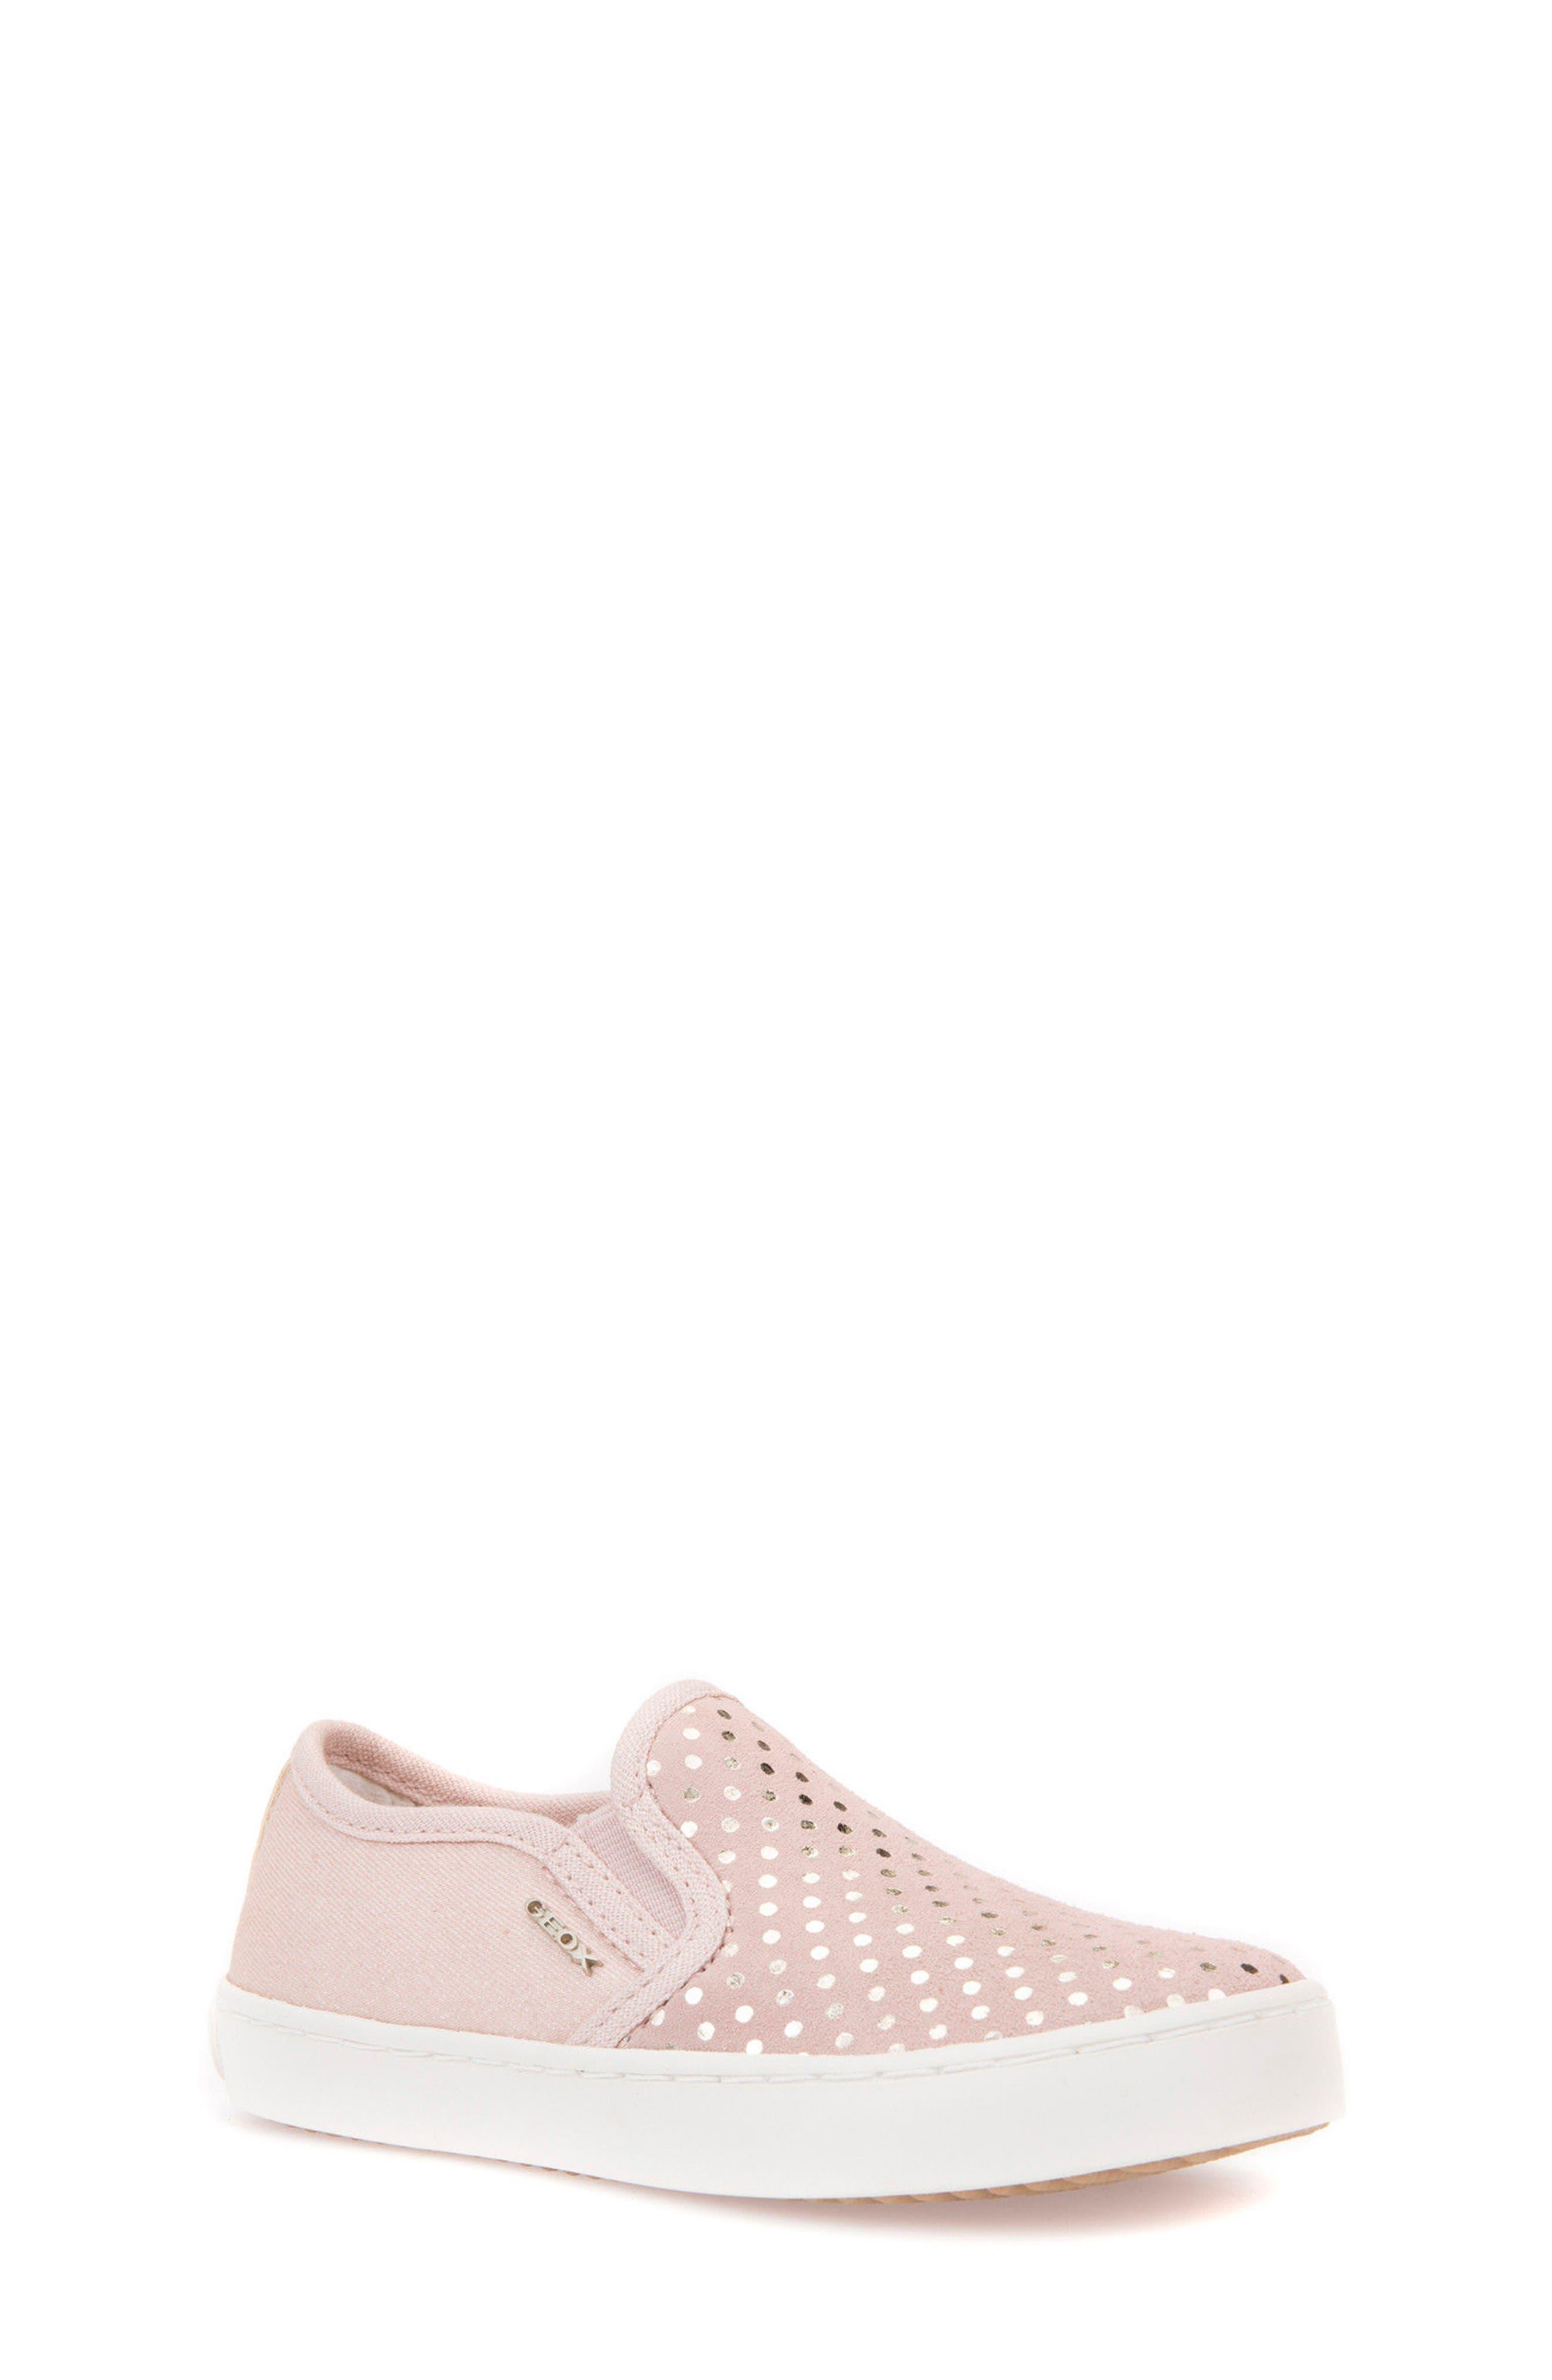 Kilwi Slip-On Sneaker,                             Main thumbnail 1, color,                             Skin